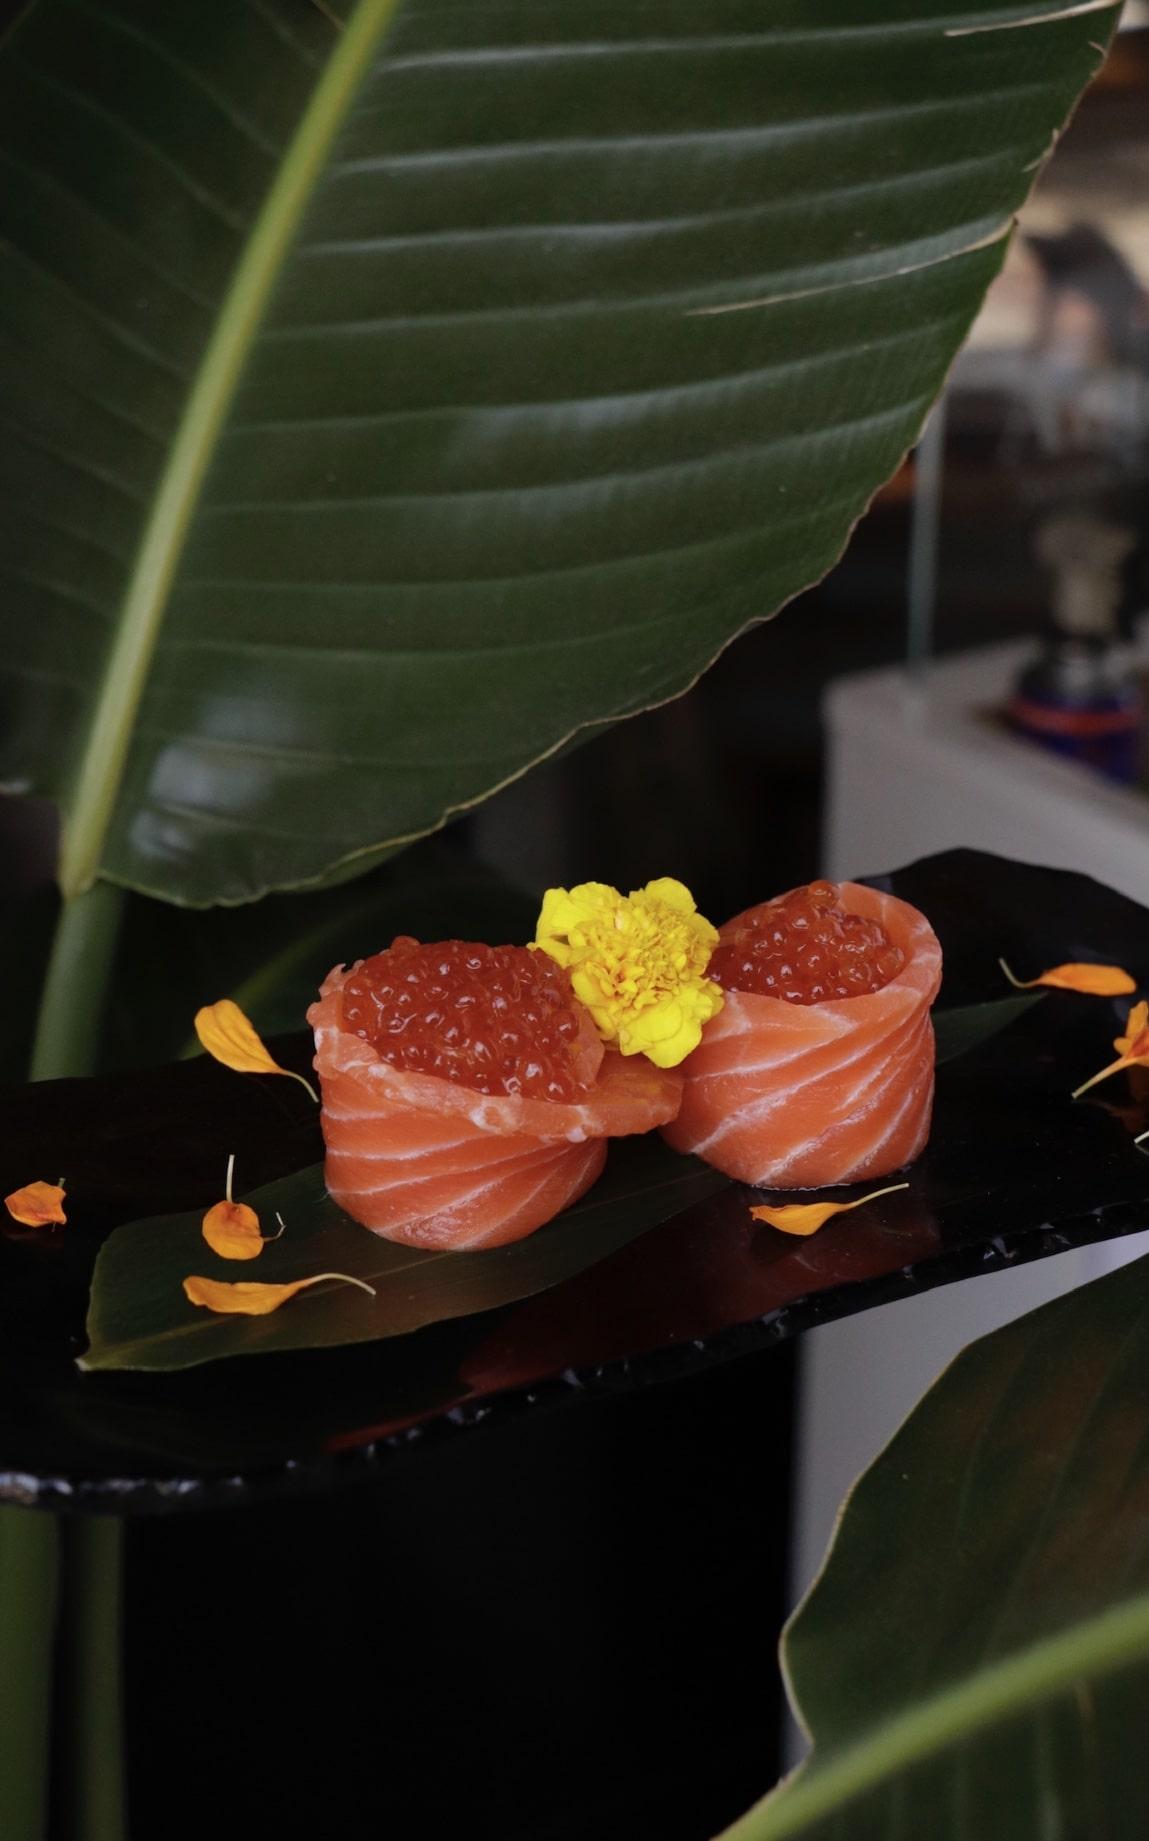 Donde comer sushi en platja d'aro - mejor sushi restaurant en girona - best places to eat sushi in the costa brava 4